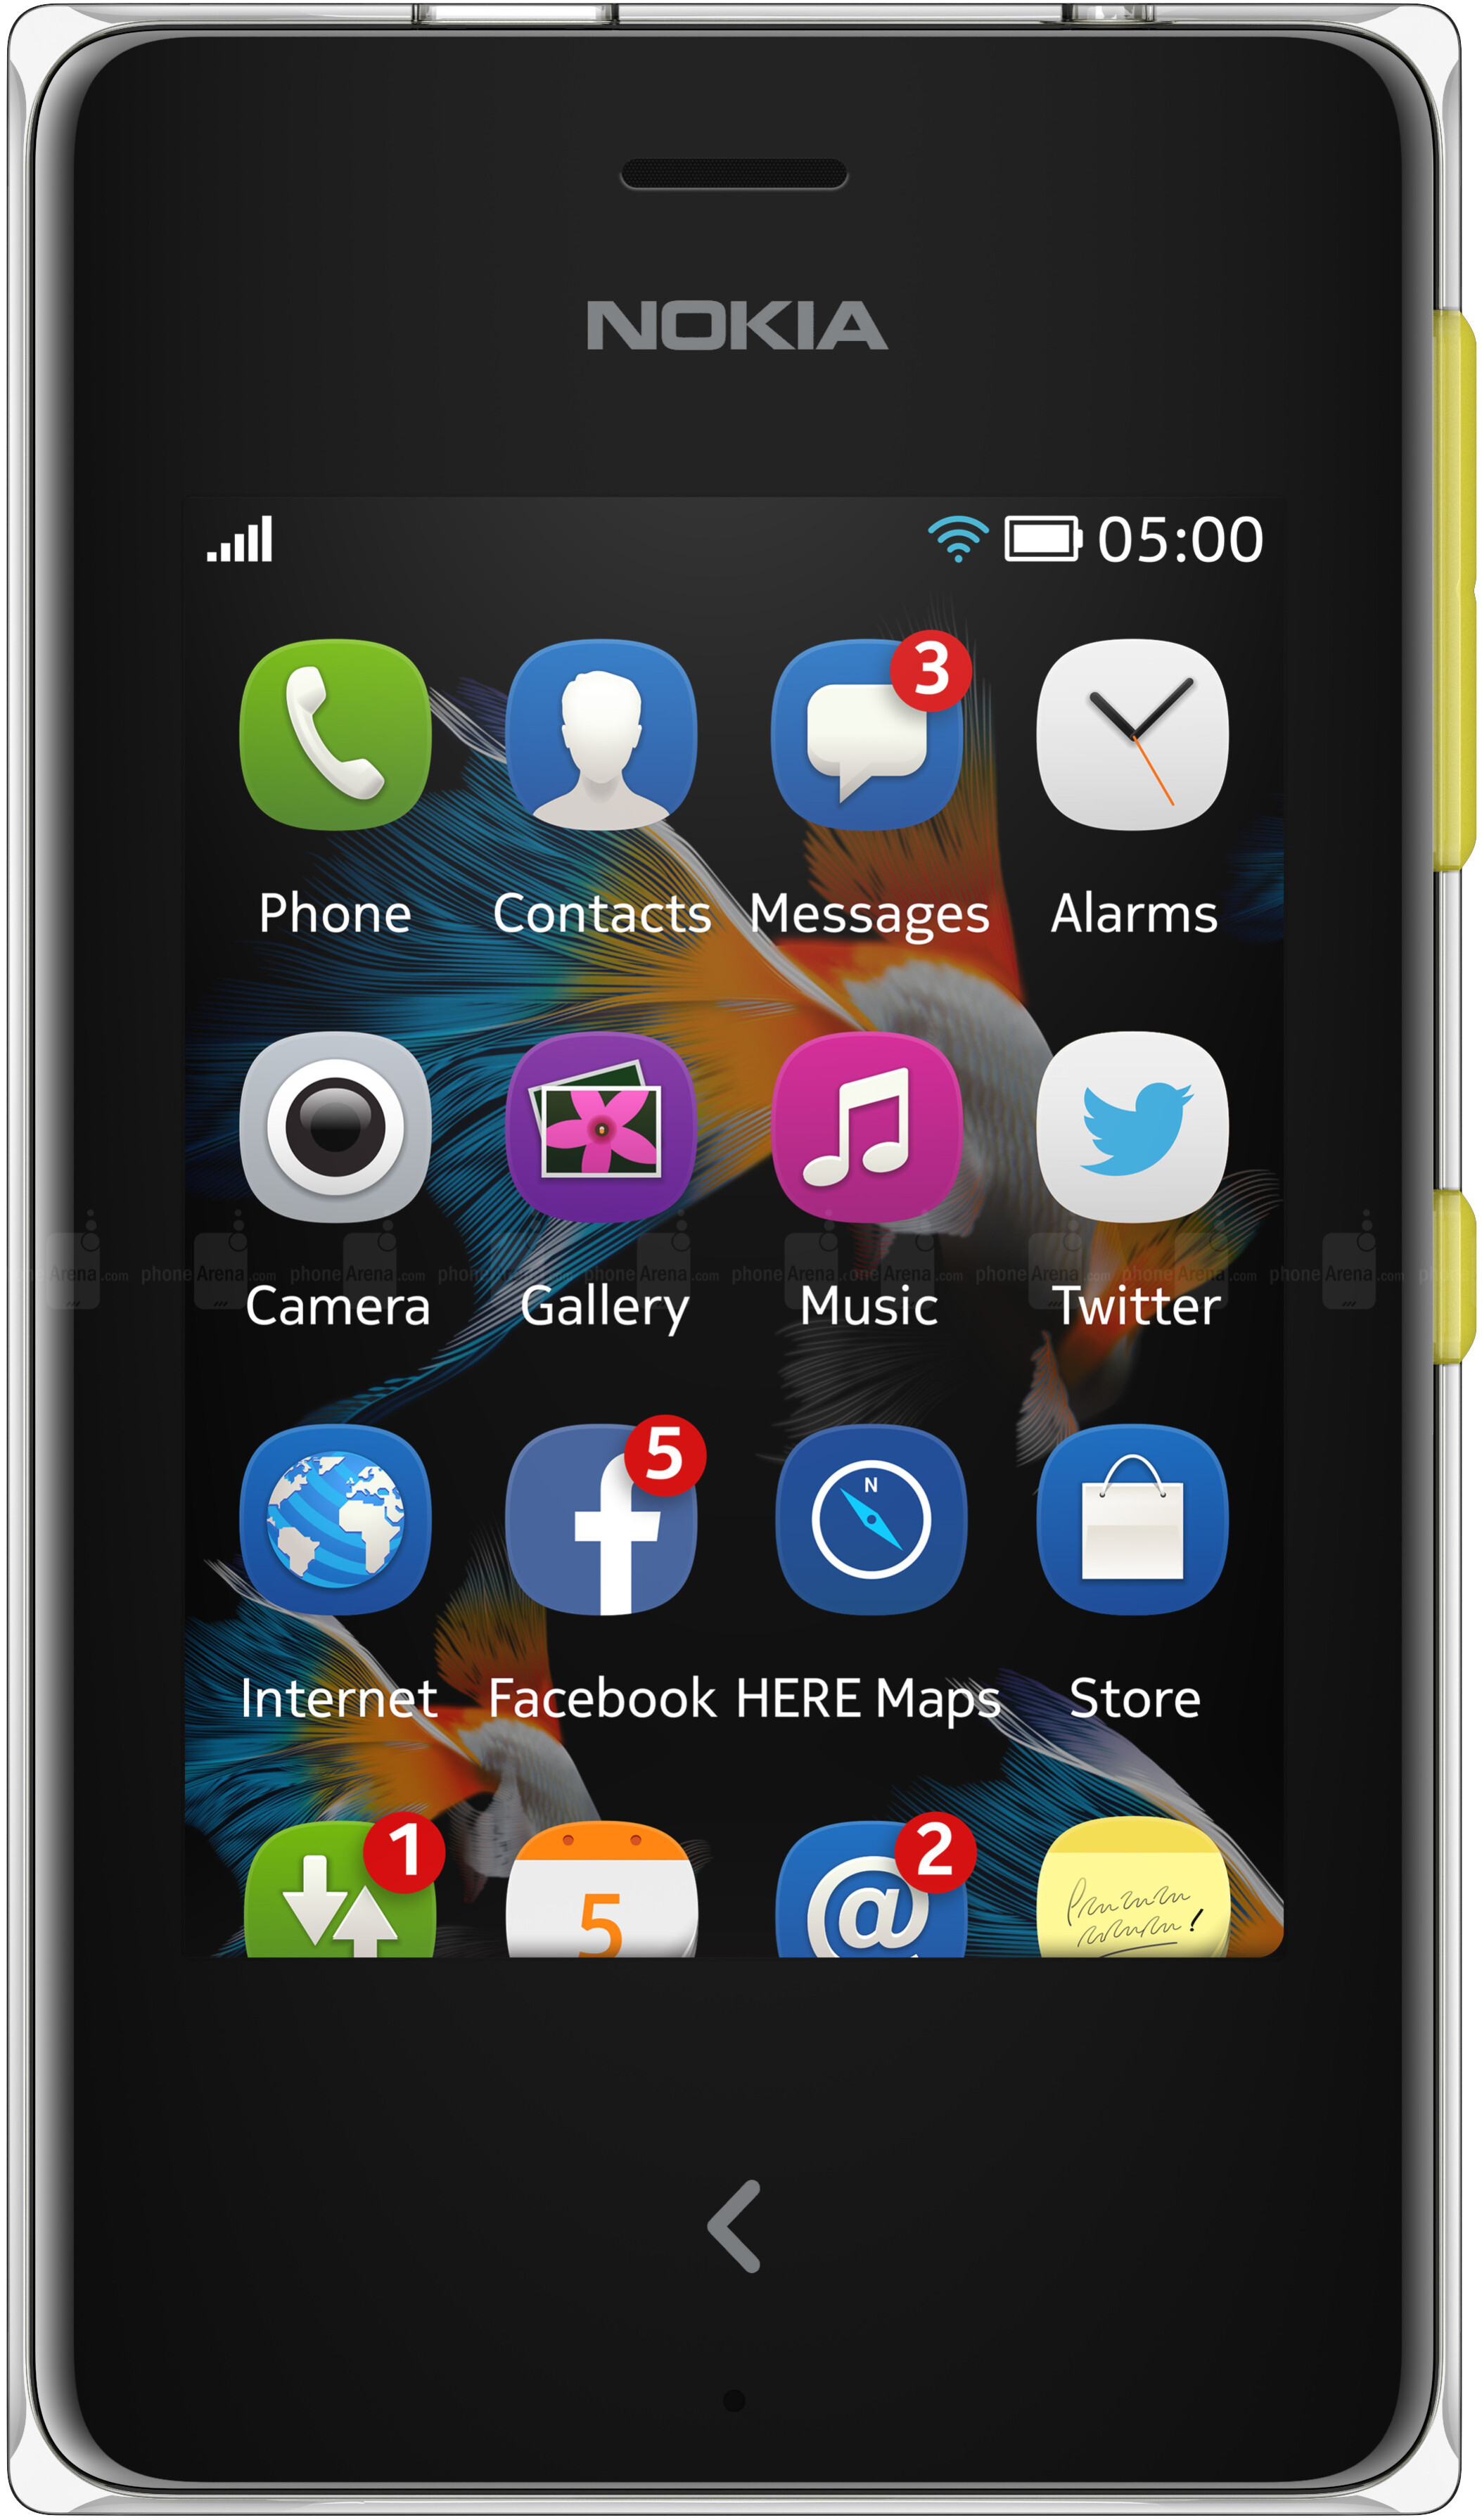 Download Ringtone Of Nokia Lumia 501